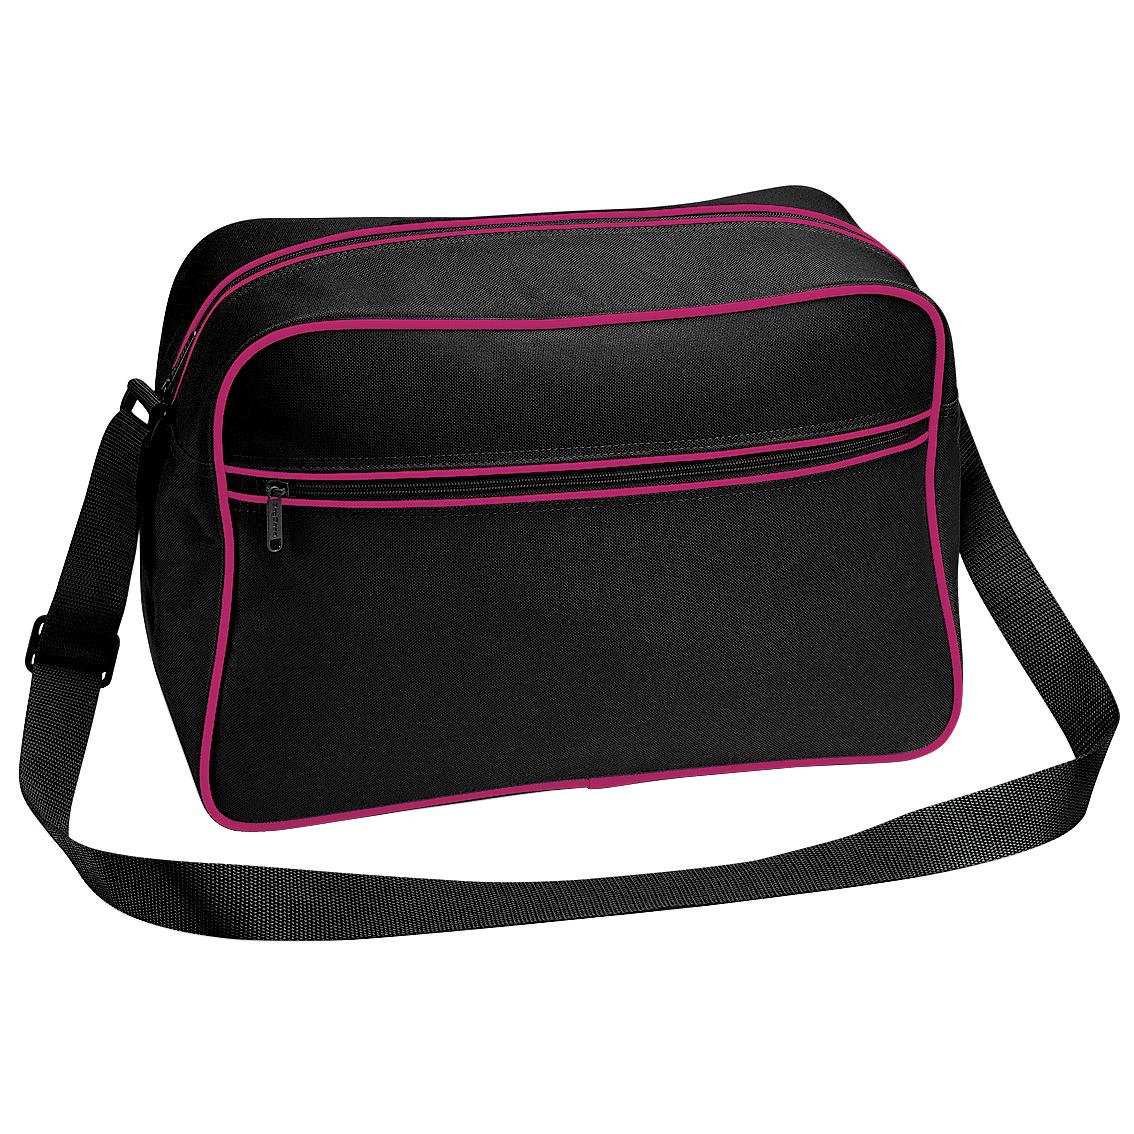 Bagbase Retro Adjustable Shoulder Bag (18 Litres) (Pack of 2) (One Size) (Black/Fuchsia)